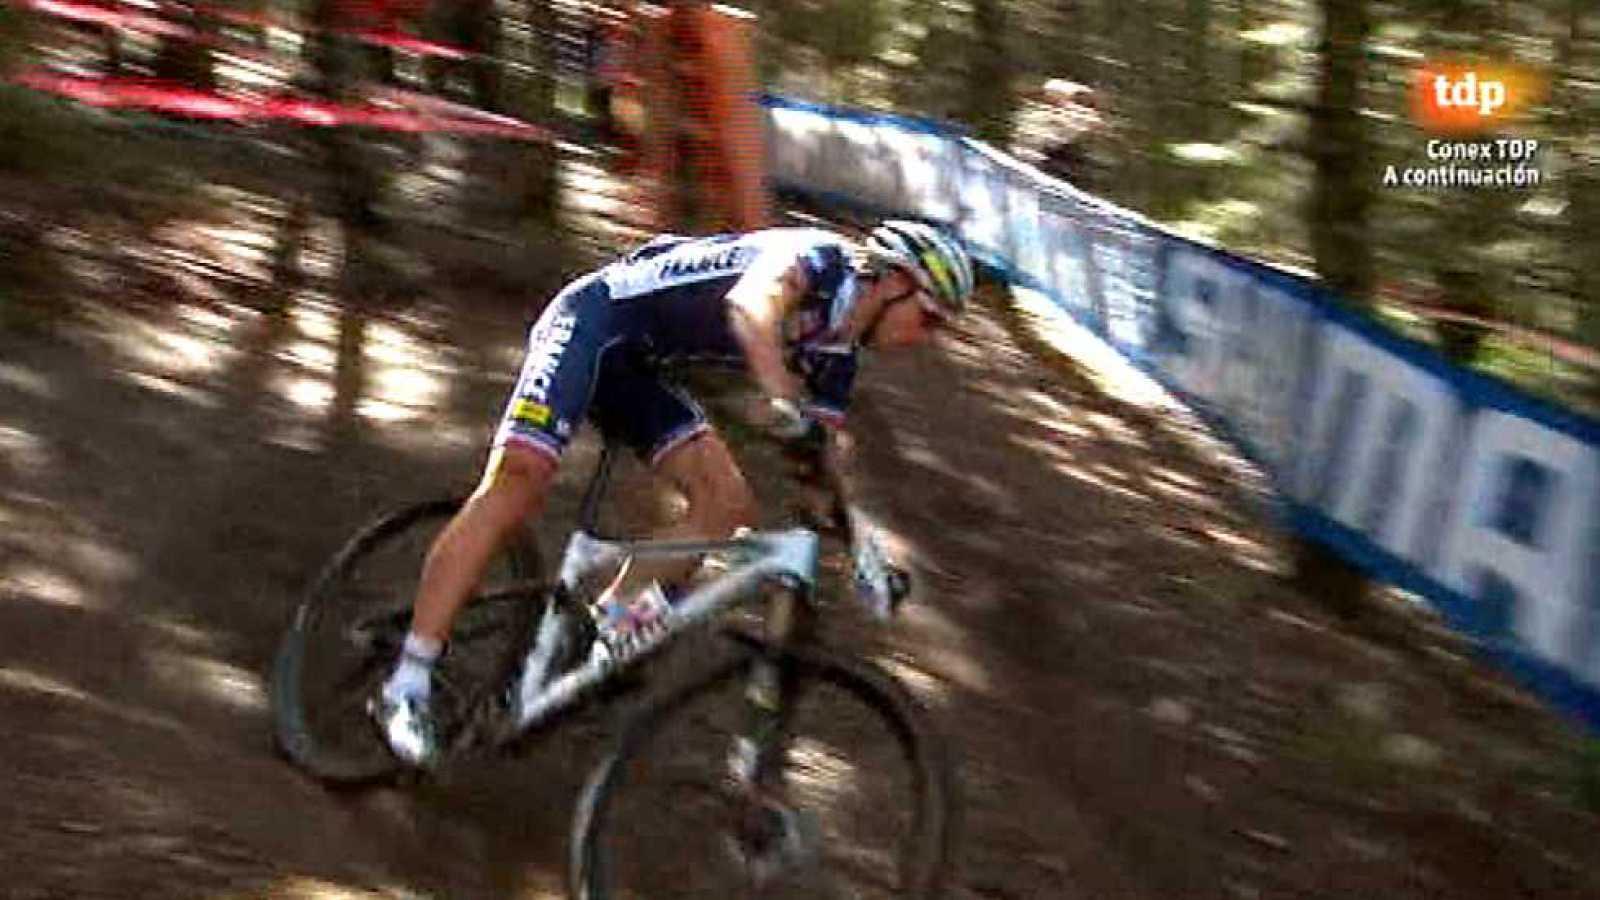 Circuito Xco Moralzarzal : Mountain bike campeonato del mundo. resumen desde vallnord